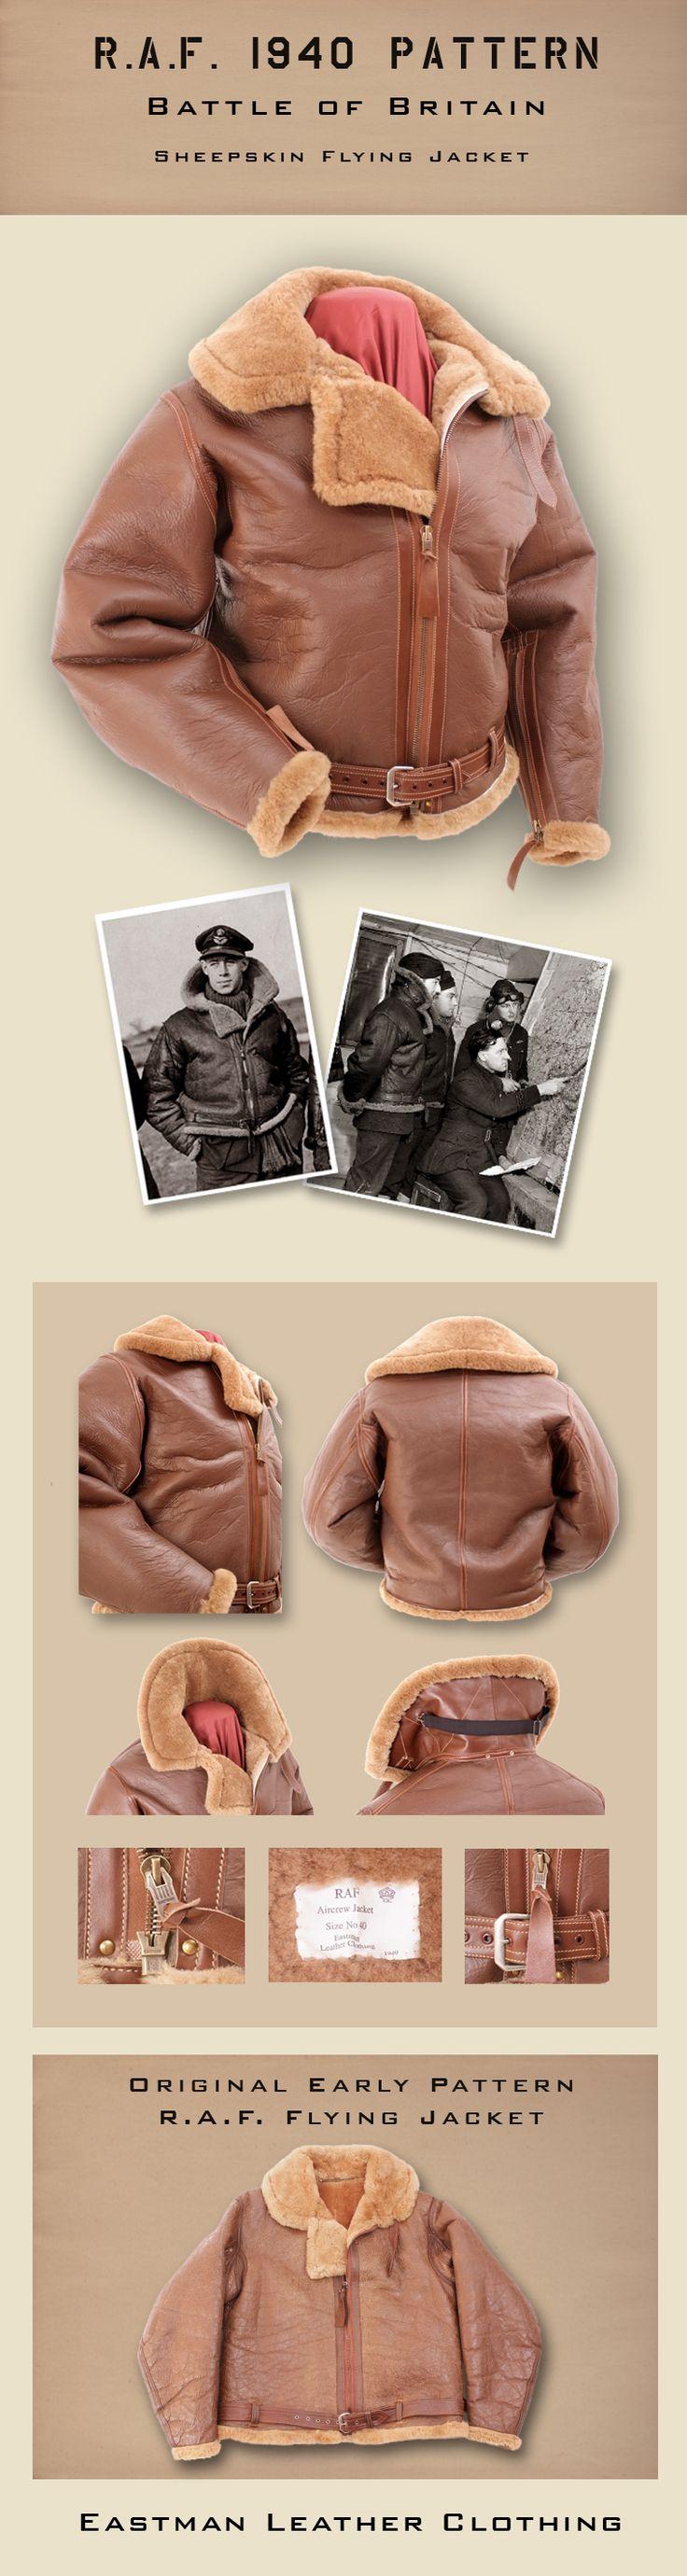 Eastman Leather Irvin flight jacket, 1940 Pattern, Battle of Britain